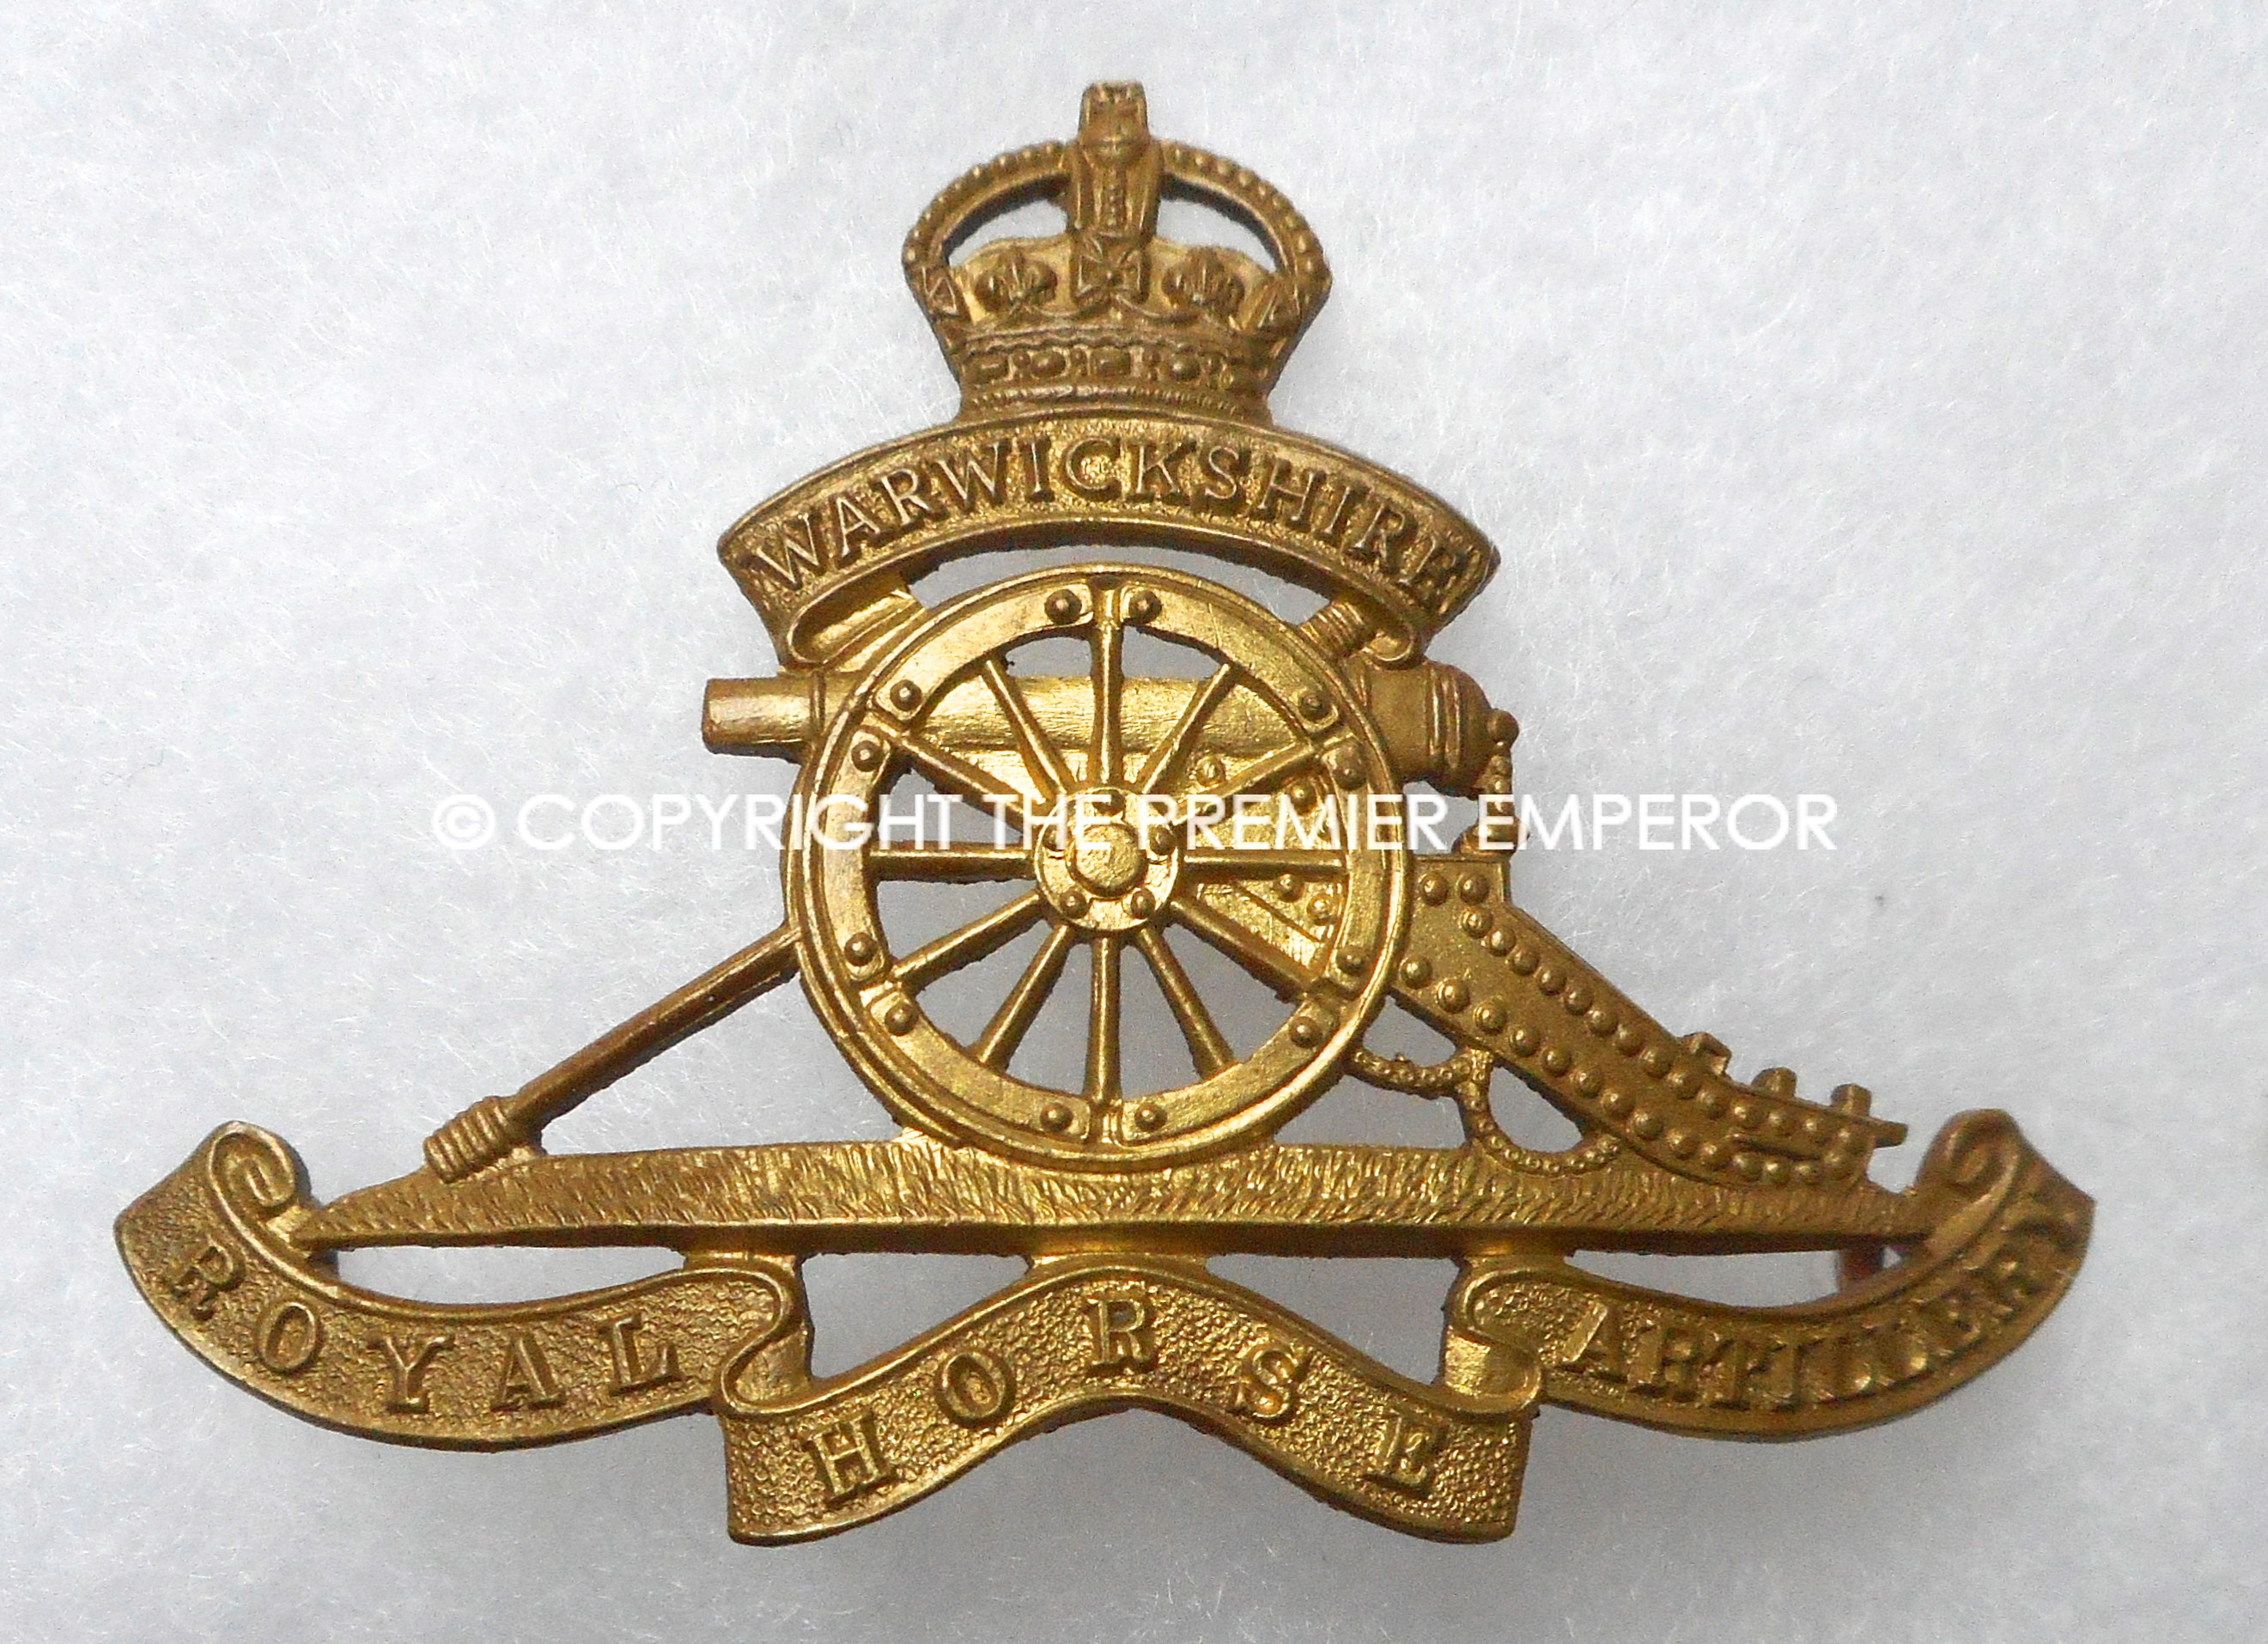 British Warwickshire Royal Horse Artillery Cap Badge Relic Militaria Military Antiques And Memorabilia